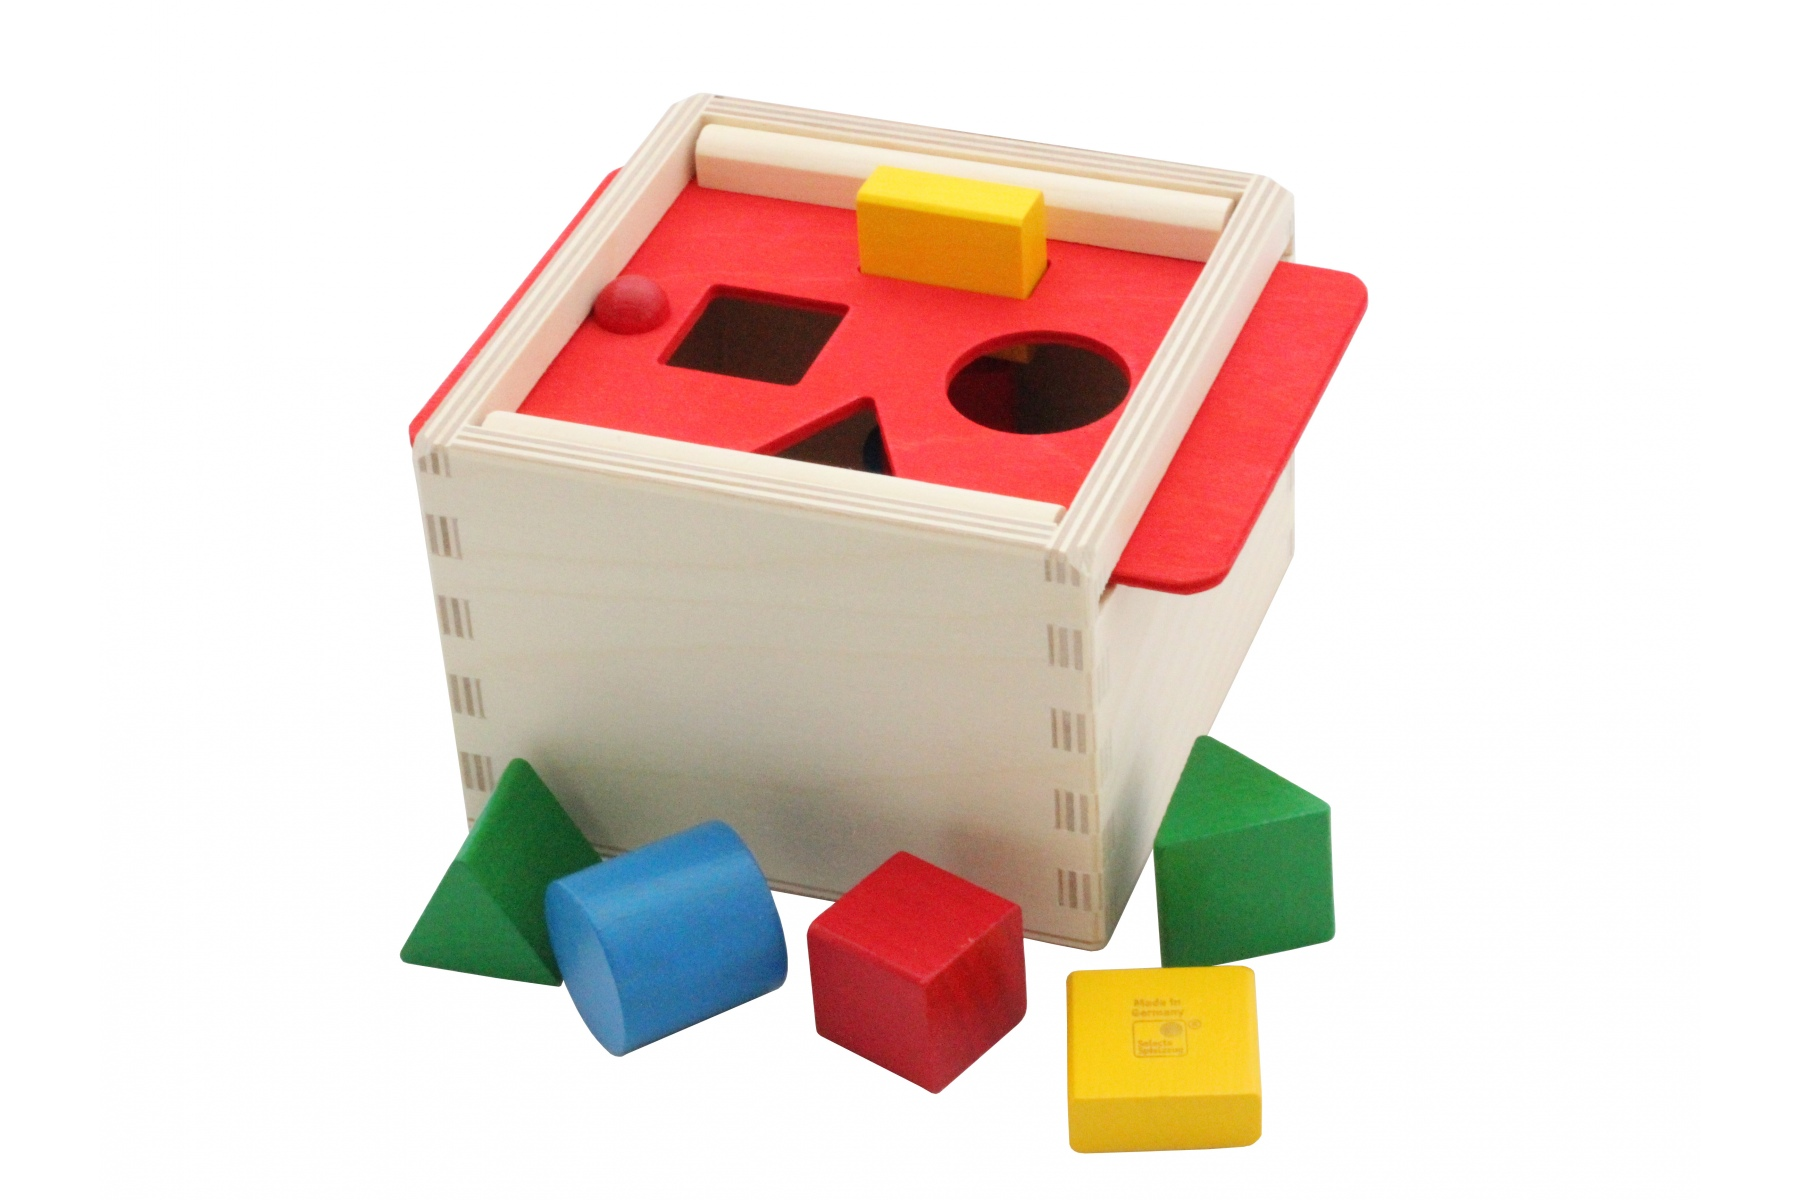 une id e de progression autour des bo tes formes montessori montessori mais pas que. Black Bedroom Furniture Sets. Home Design Ideas